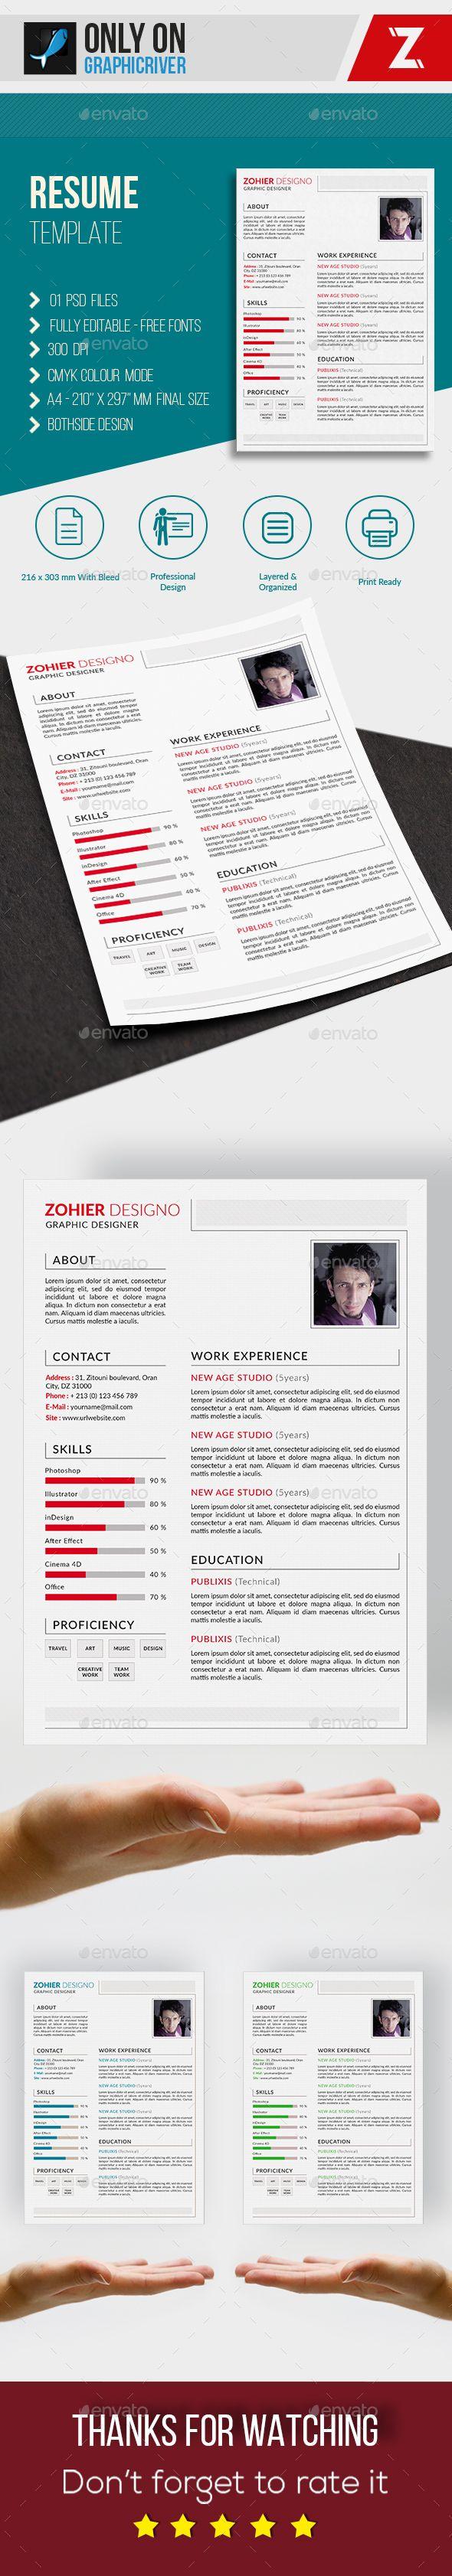 Resume Template | Resume Templates | Pinterest